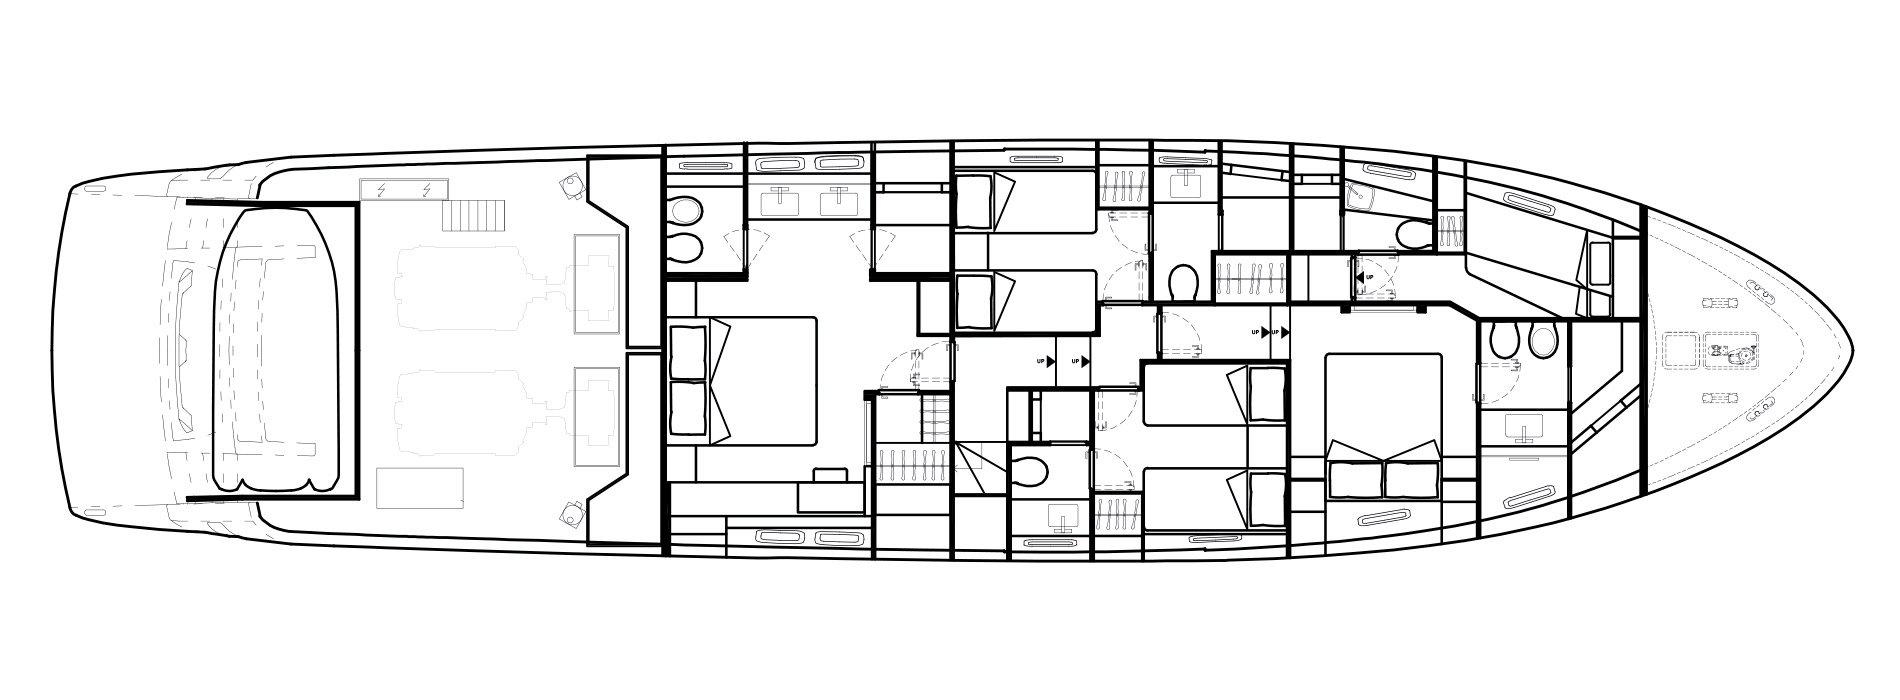 Sanlorenzo Yachts SL78 下层甲板 Versione A